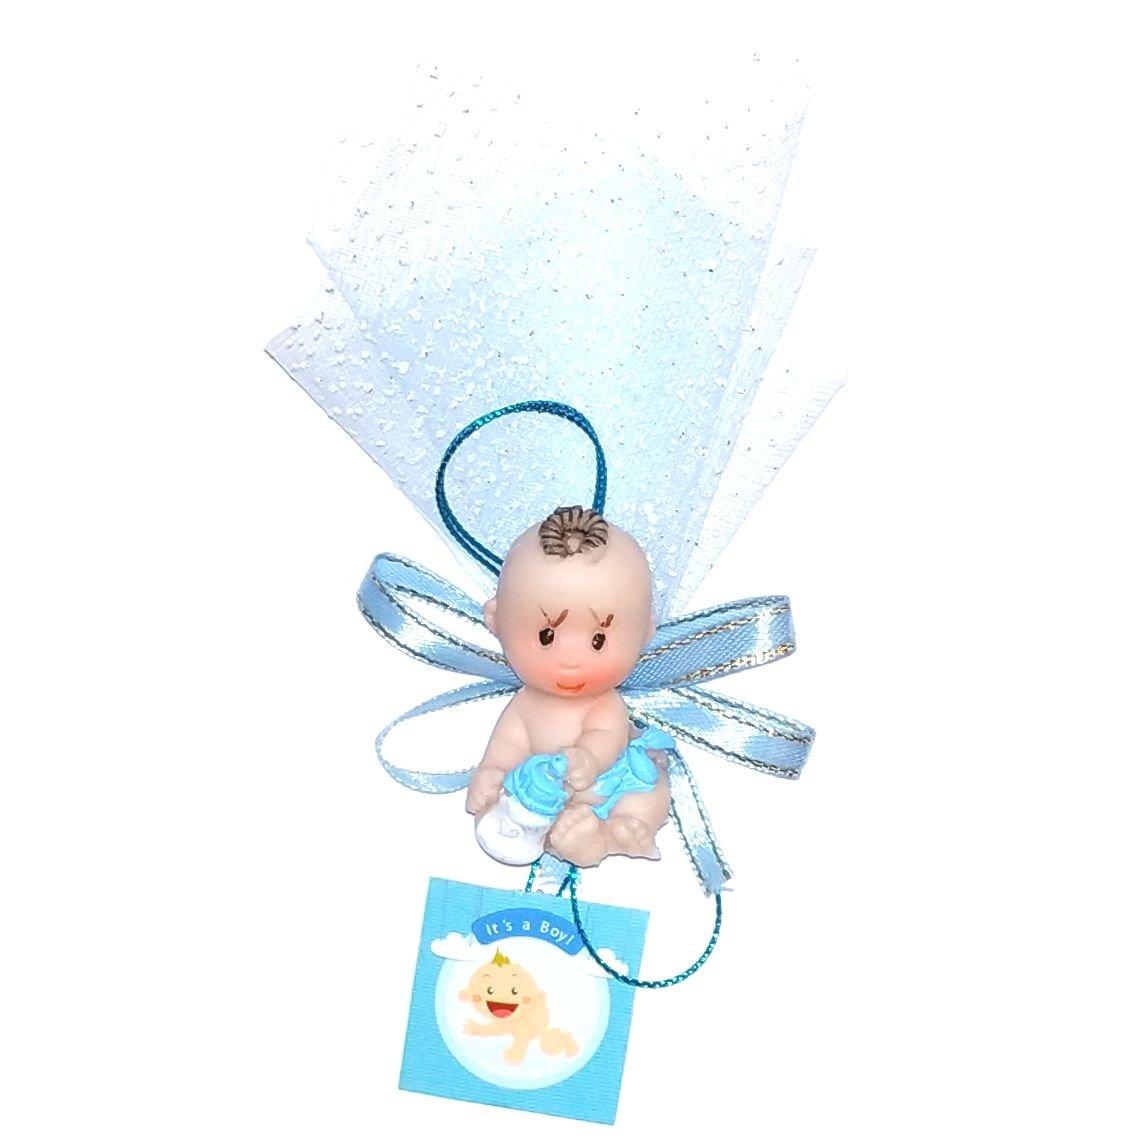 گیفت تولد و سیسمونی کودک طرح نوزاد پسر کد O-H  بسته 10 عددی